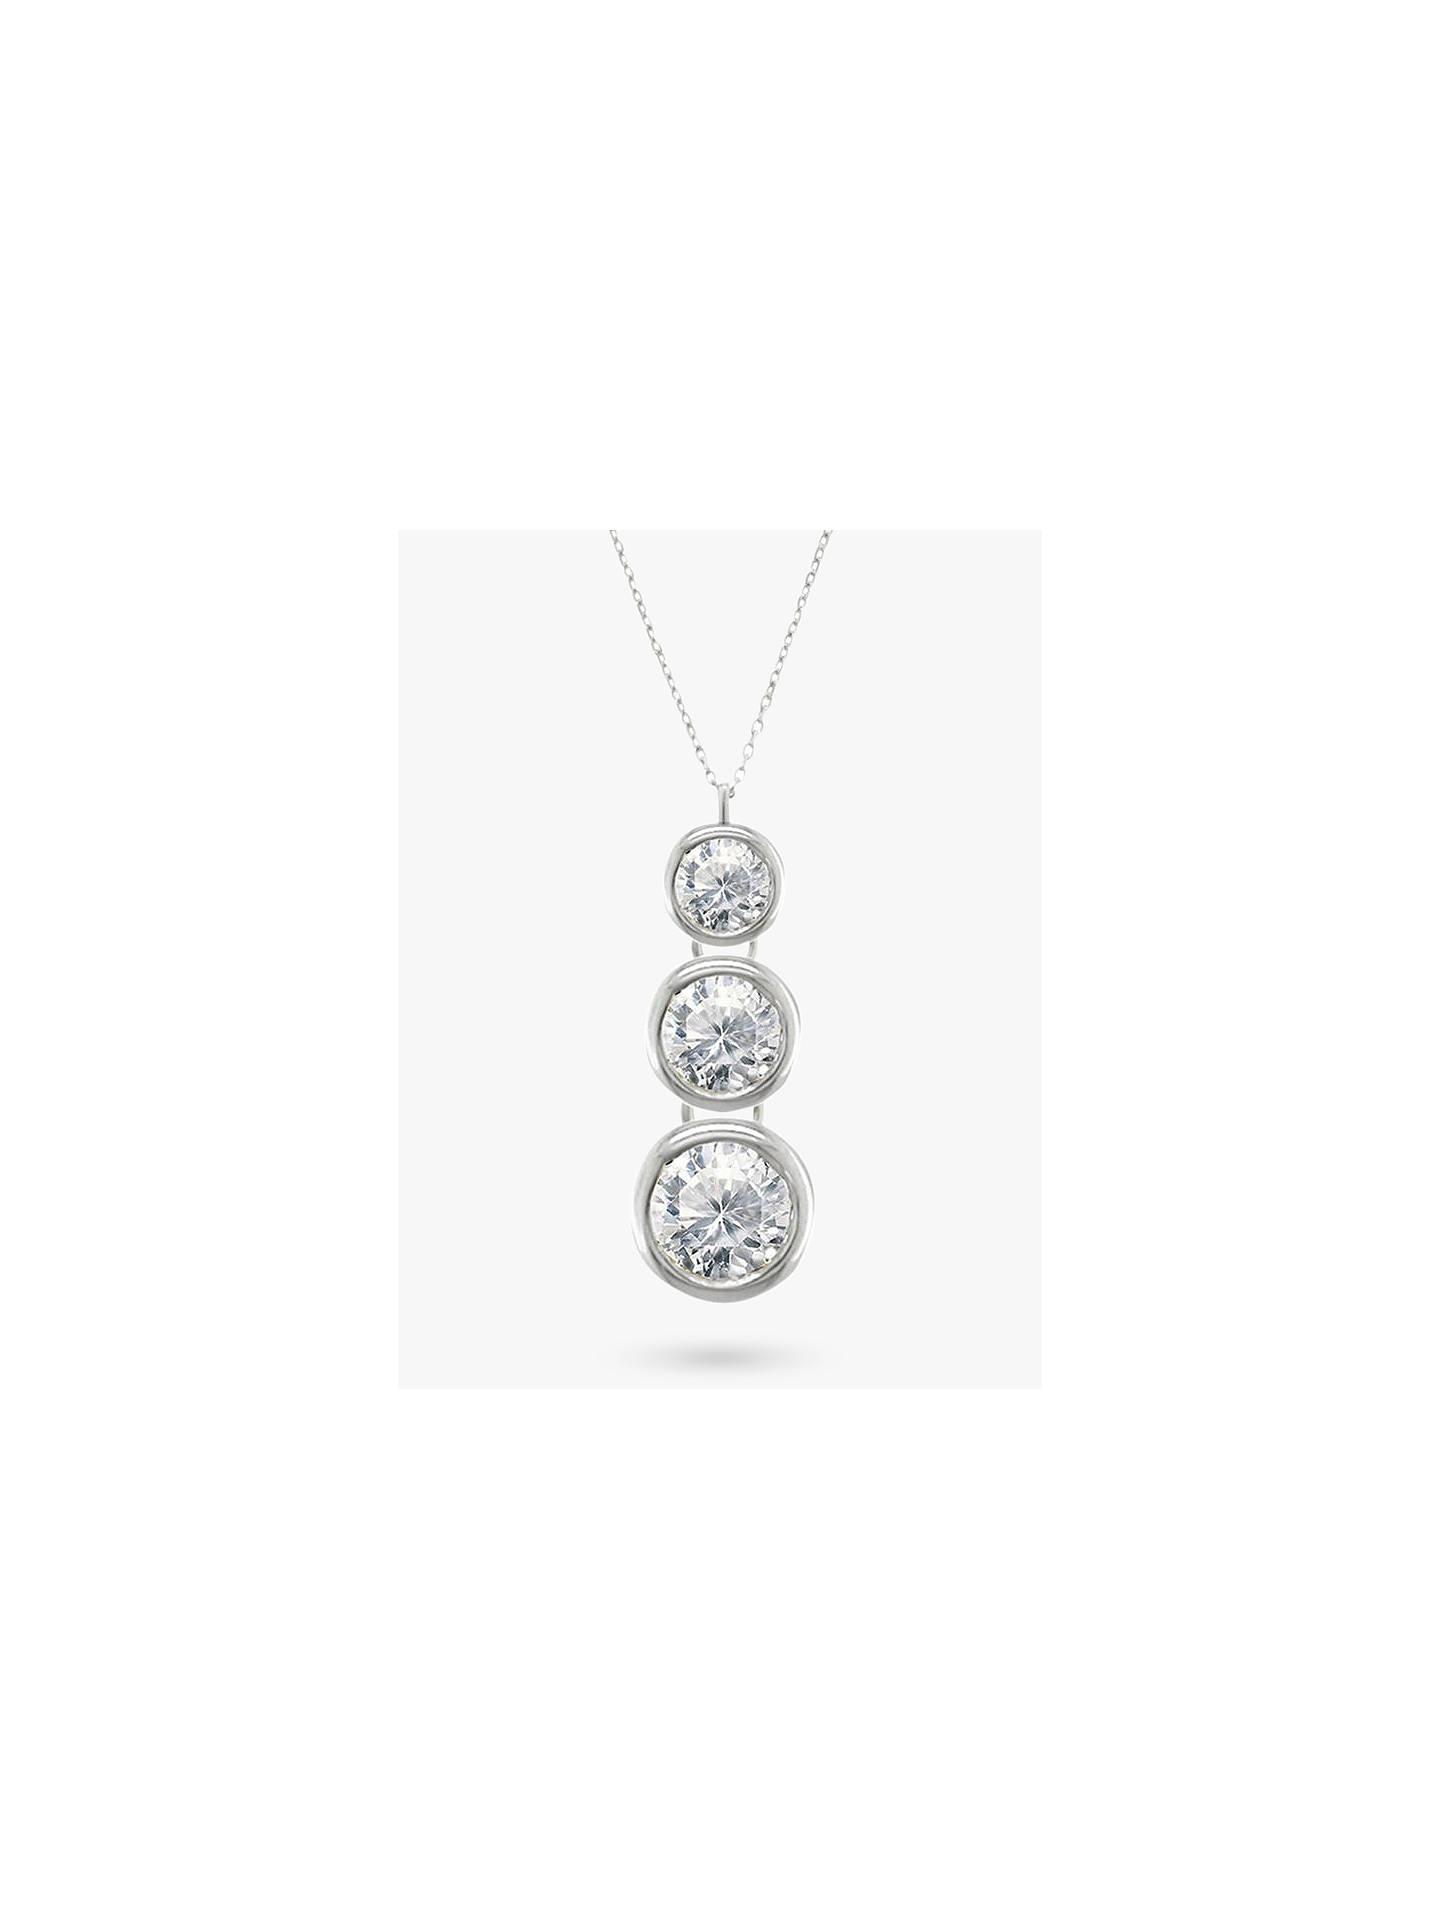 2352b4cee1b9e0 Buy E.W Adams 18ct White Gold Trilogy Rub Over Diamond Pendant Necklace  Online at johnlewis.